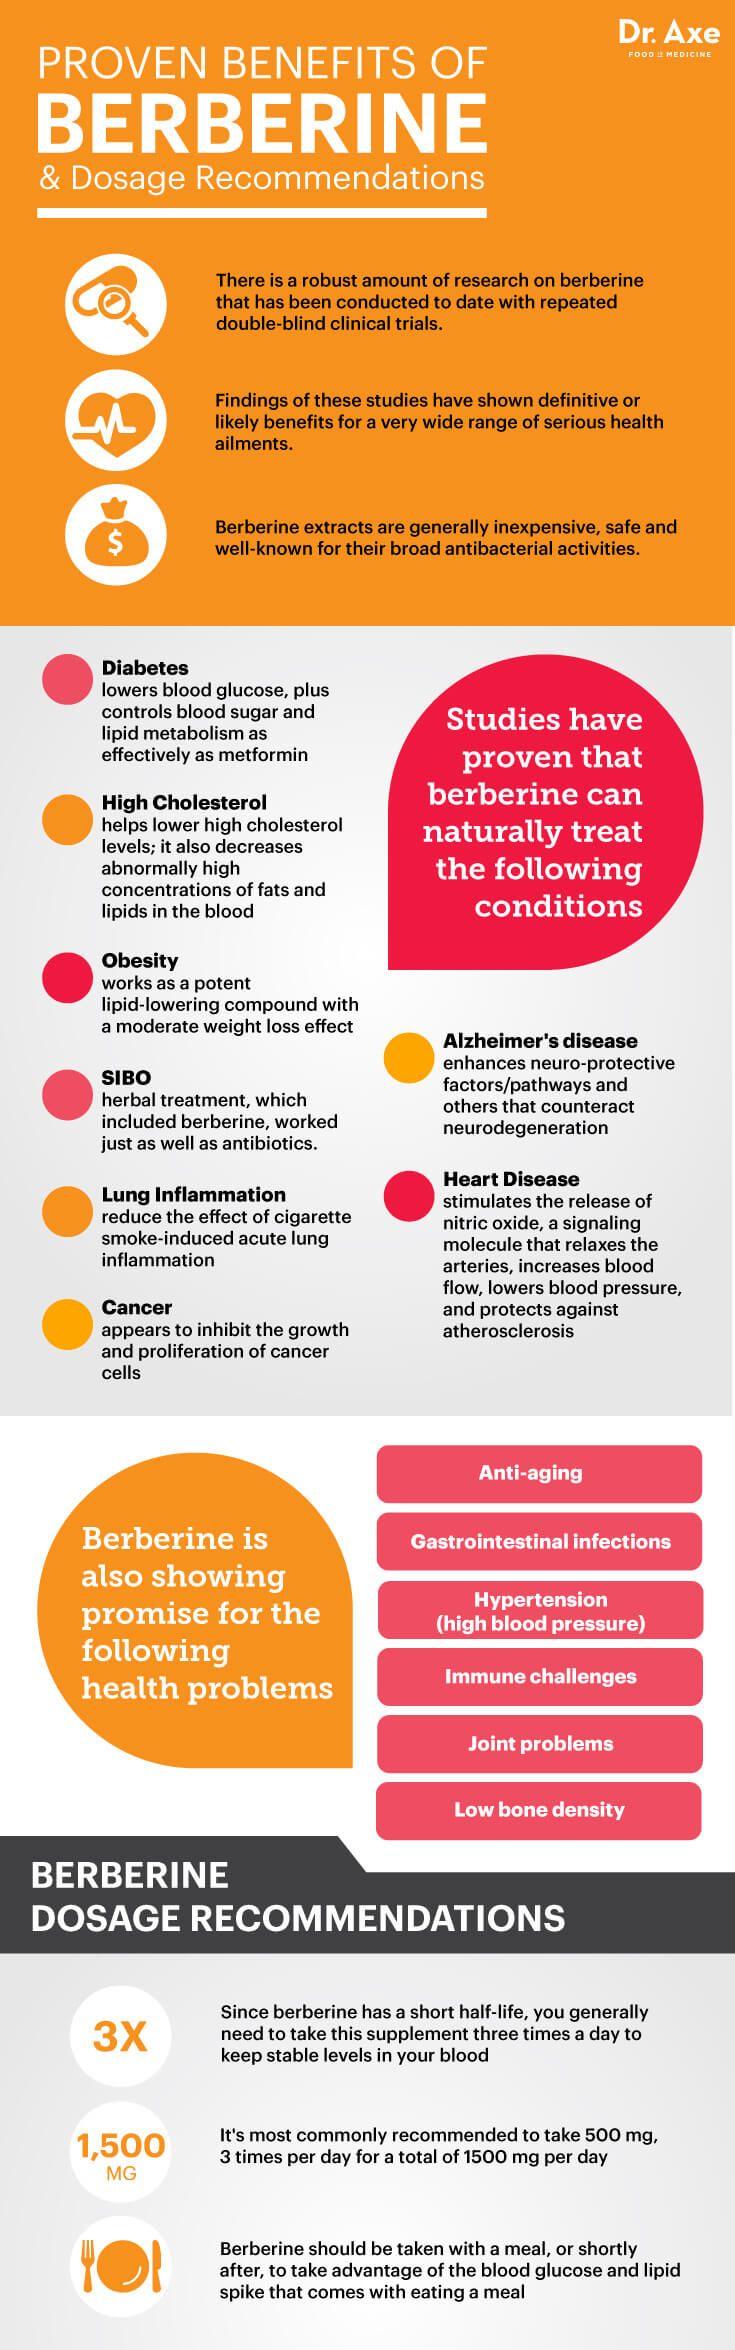 It's Amazing The Plant Alkaloid that Treats Diabetes & Digestive Problems